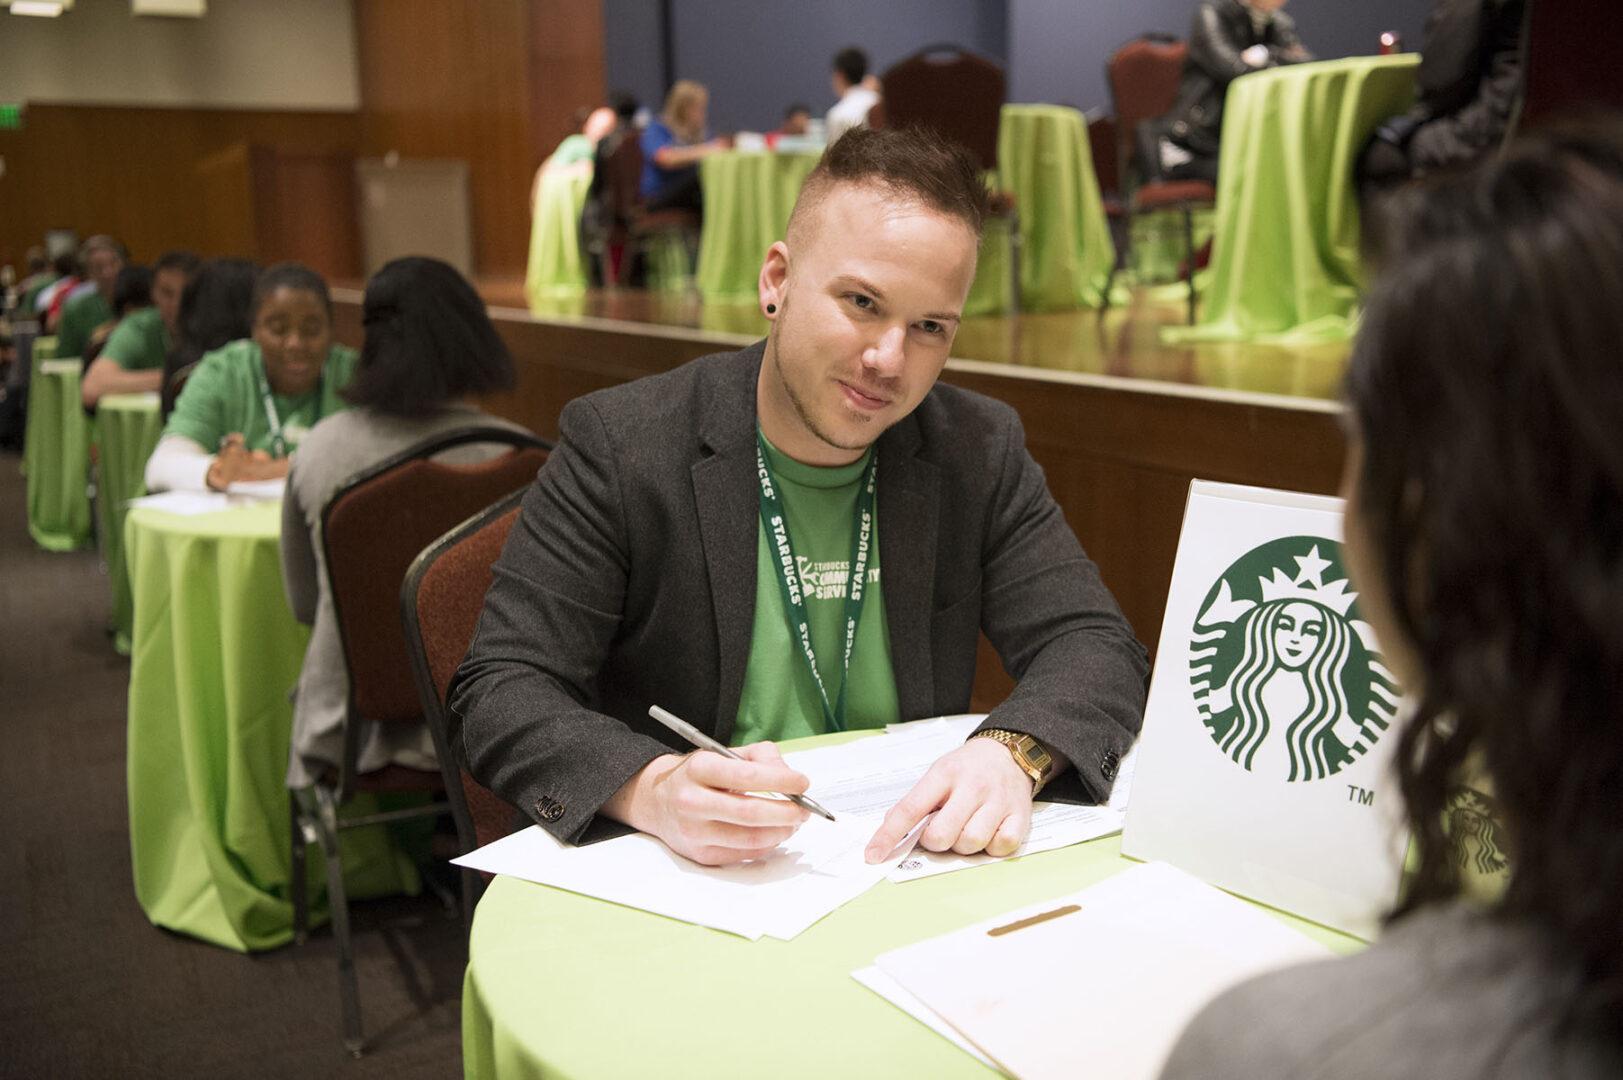 Starbucks Volunteers at Community Service Event